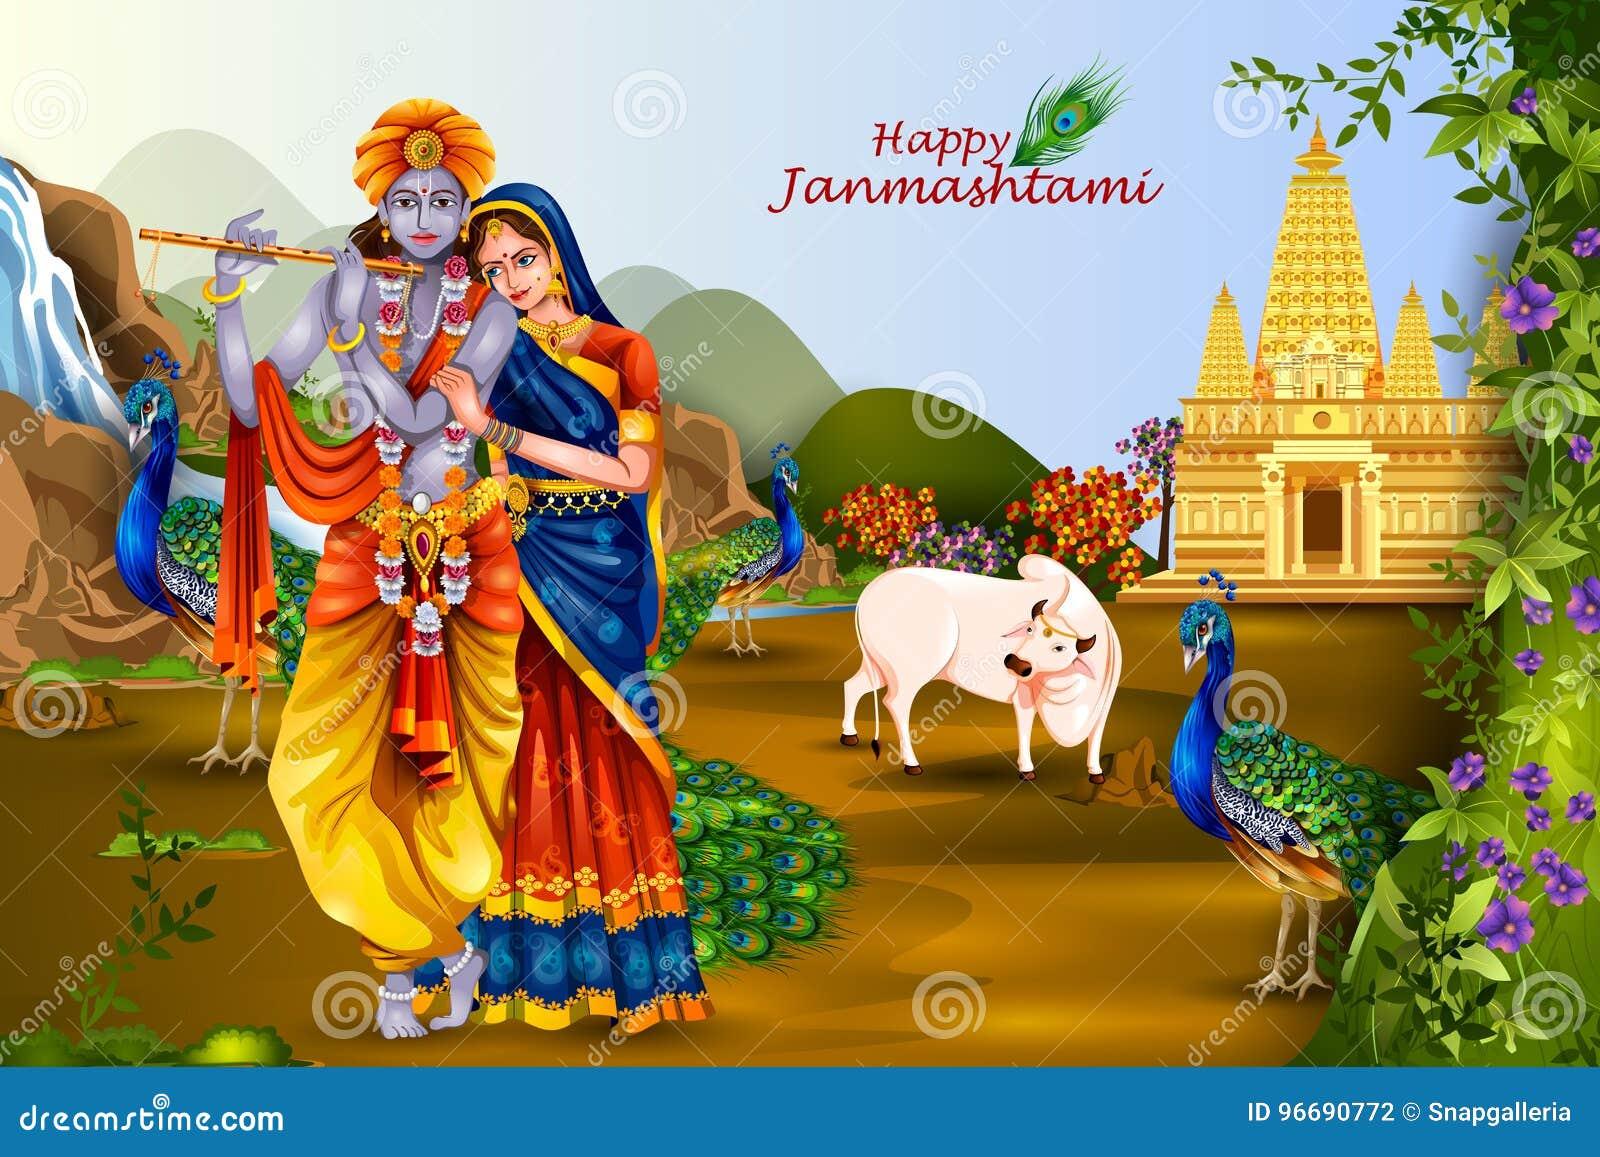 Lord Krishna And Radha On Happy Janmashtami Background Stock Vector